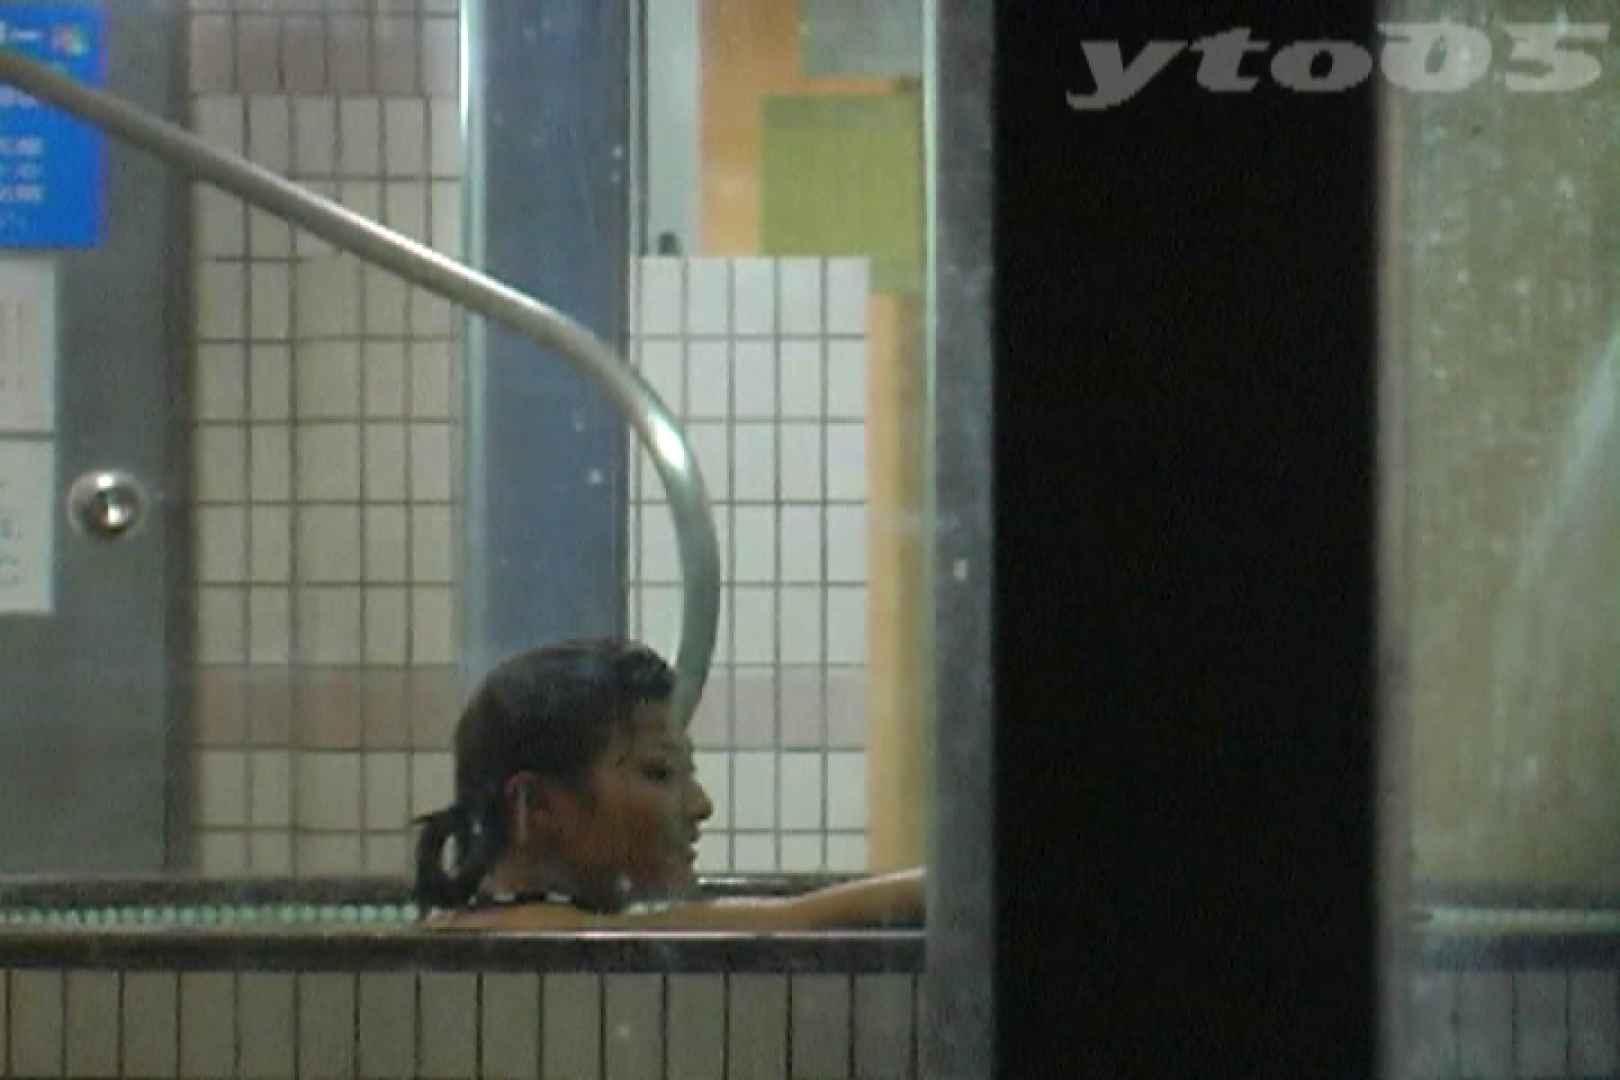 ▲復活限定▲合宿ホテル女風呂盗撮 Vol.31 期間限定 AV無料 85pic 51